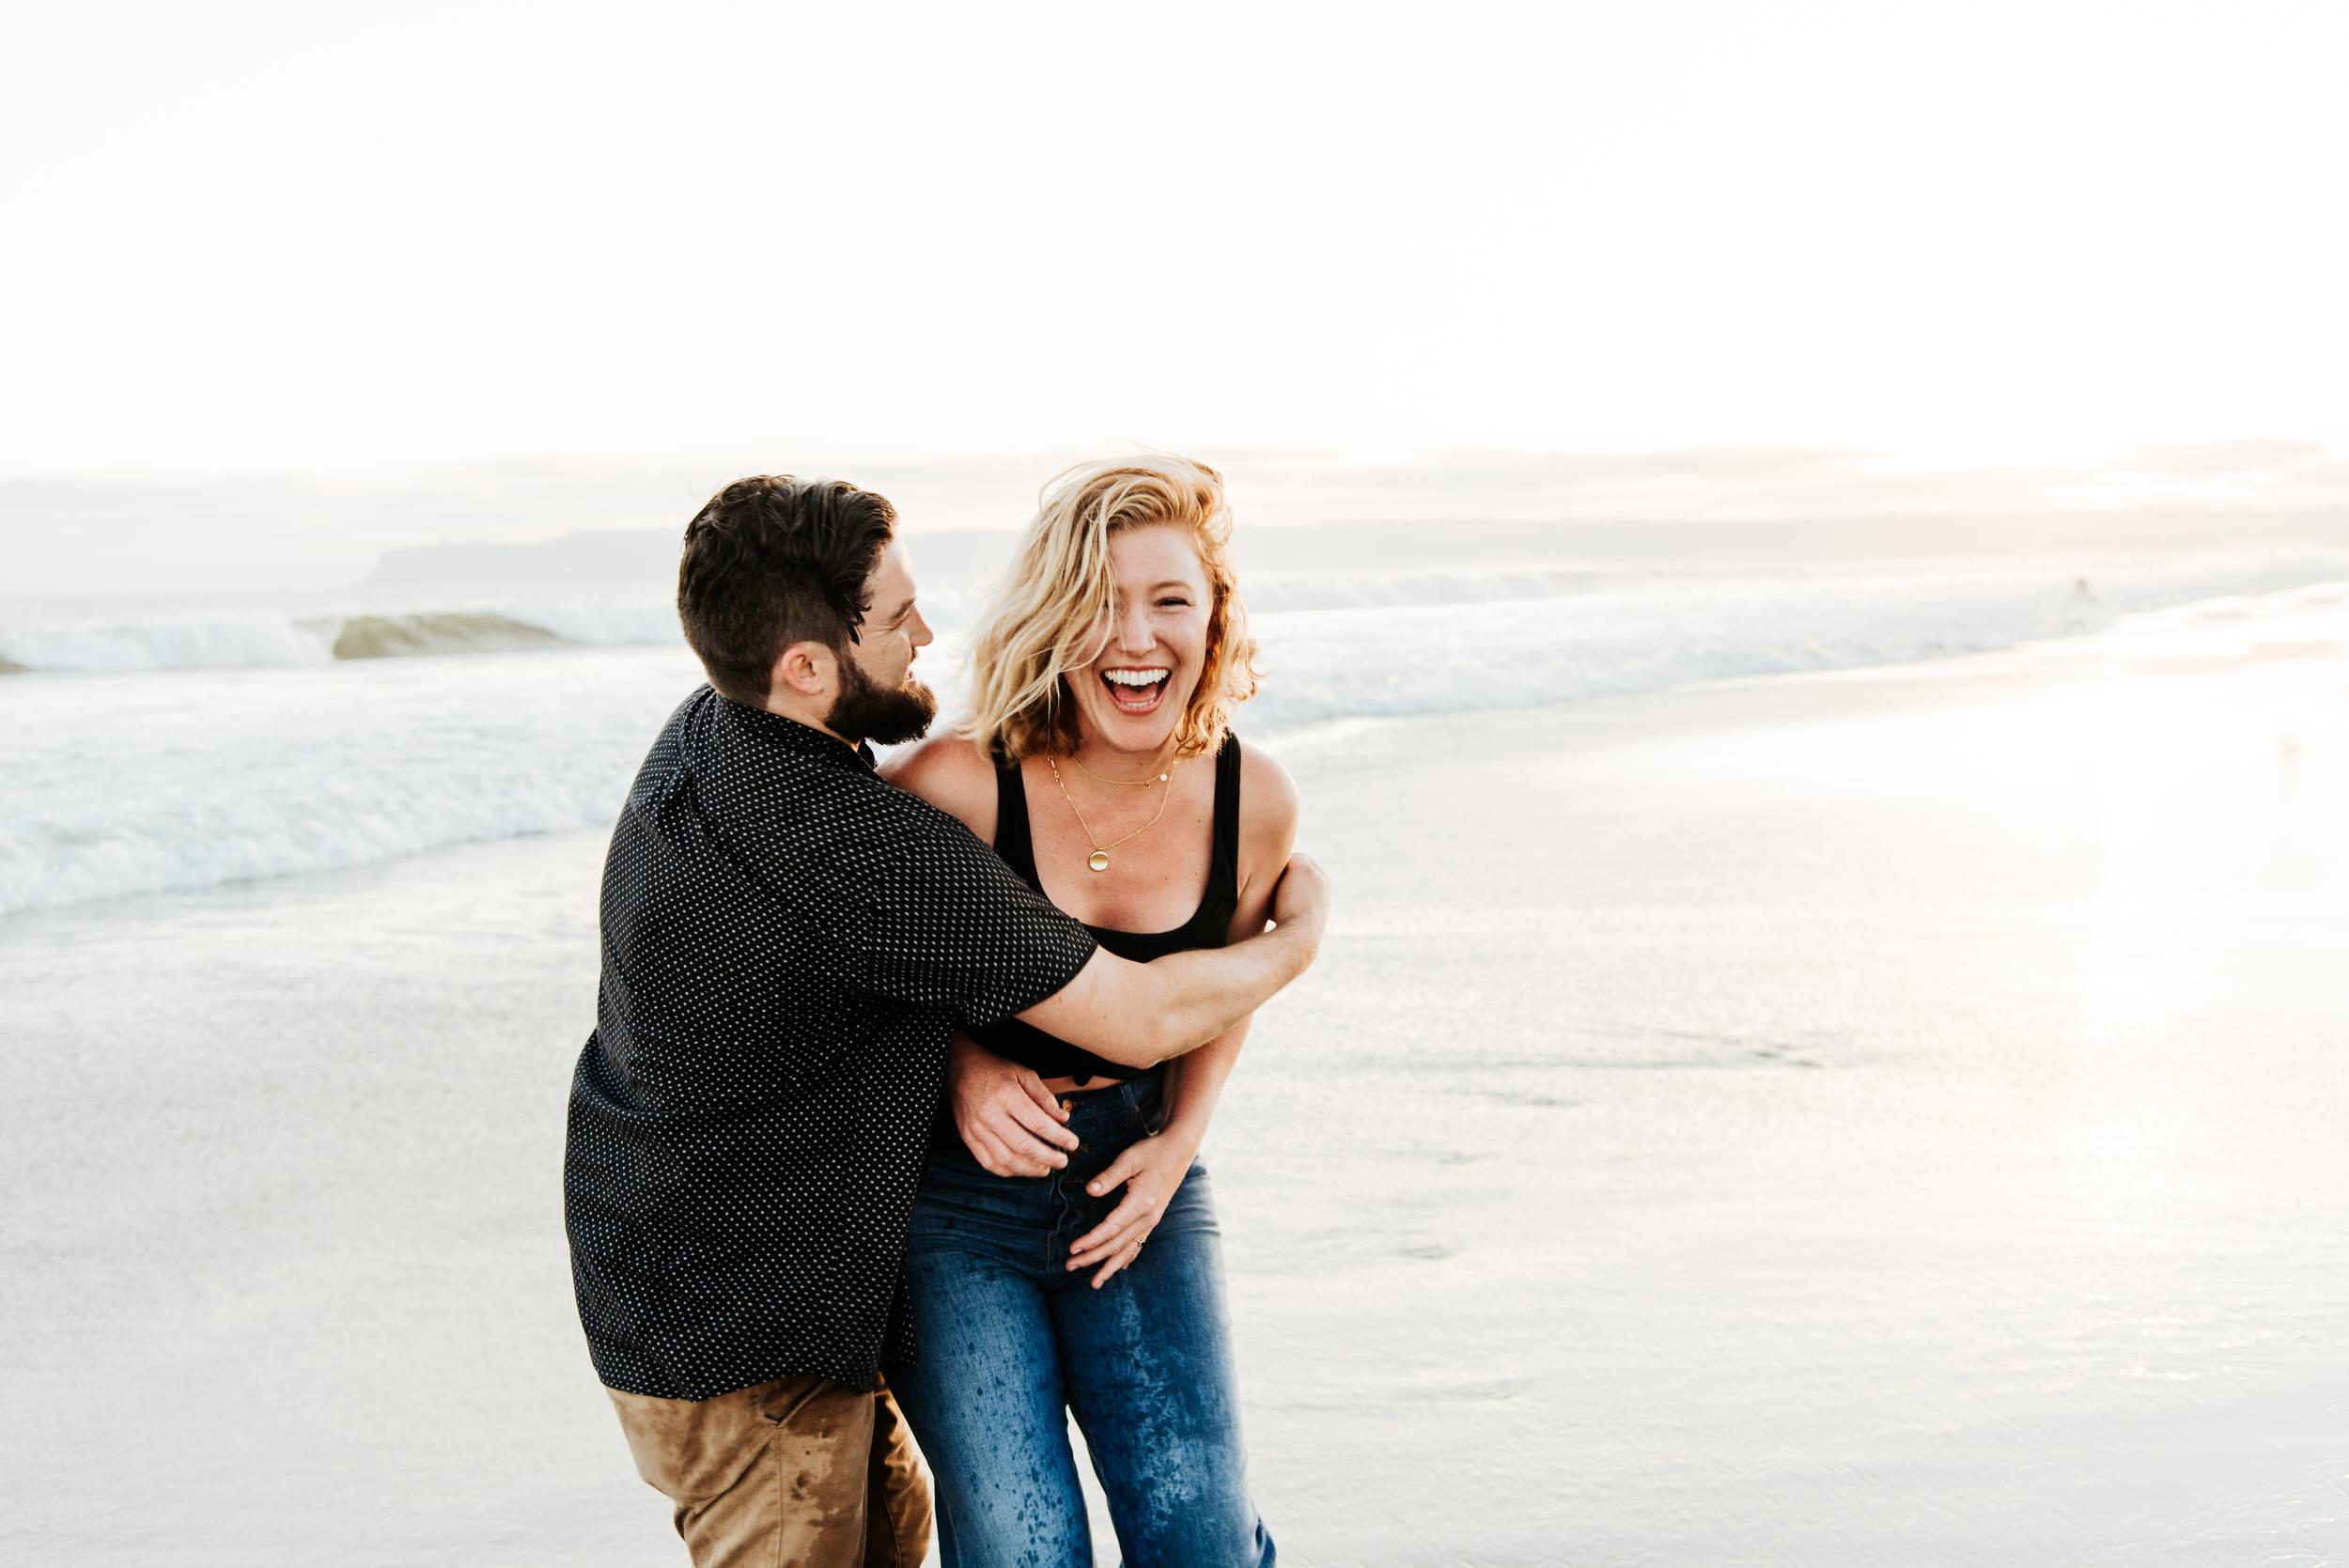 SoCal Standard - San Diego Engagement Photographer - Beach Bonfire at the Hotel Del Coronado-24.jpg